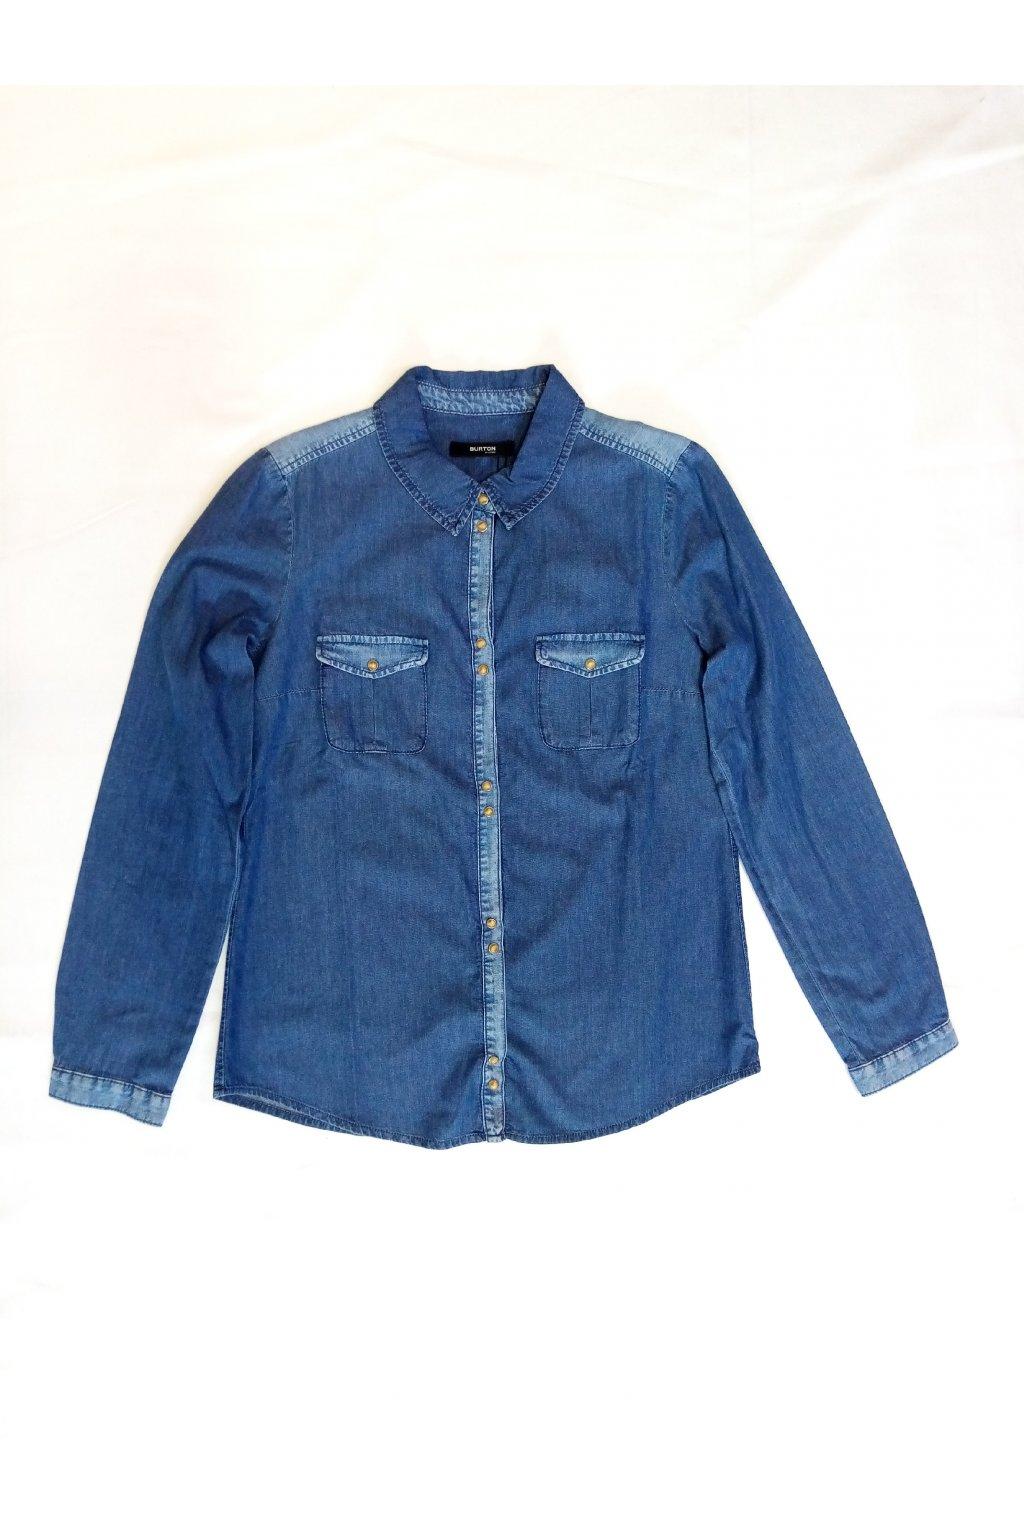 Dámská košile Burton 115115100004